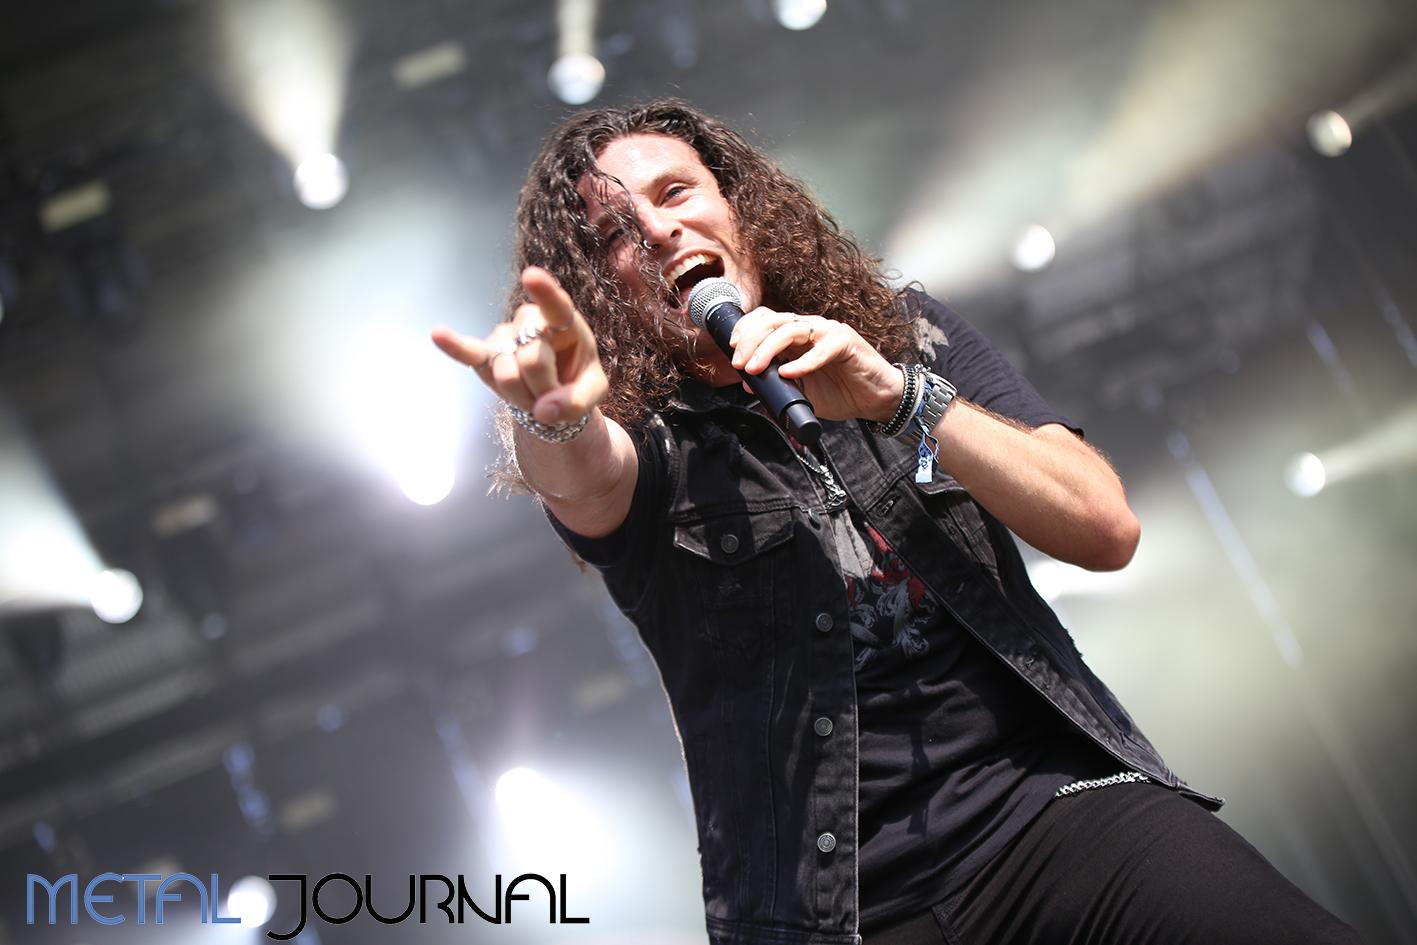 kilmara - metal journal rock fest barcelona 2019 pic 1